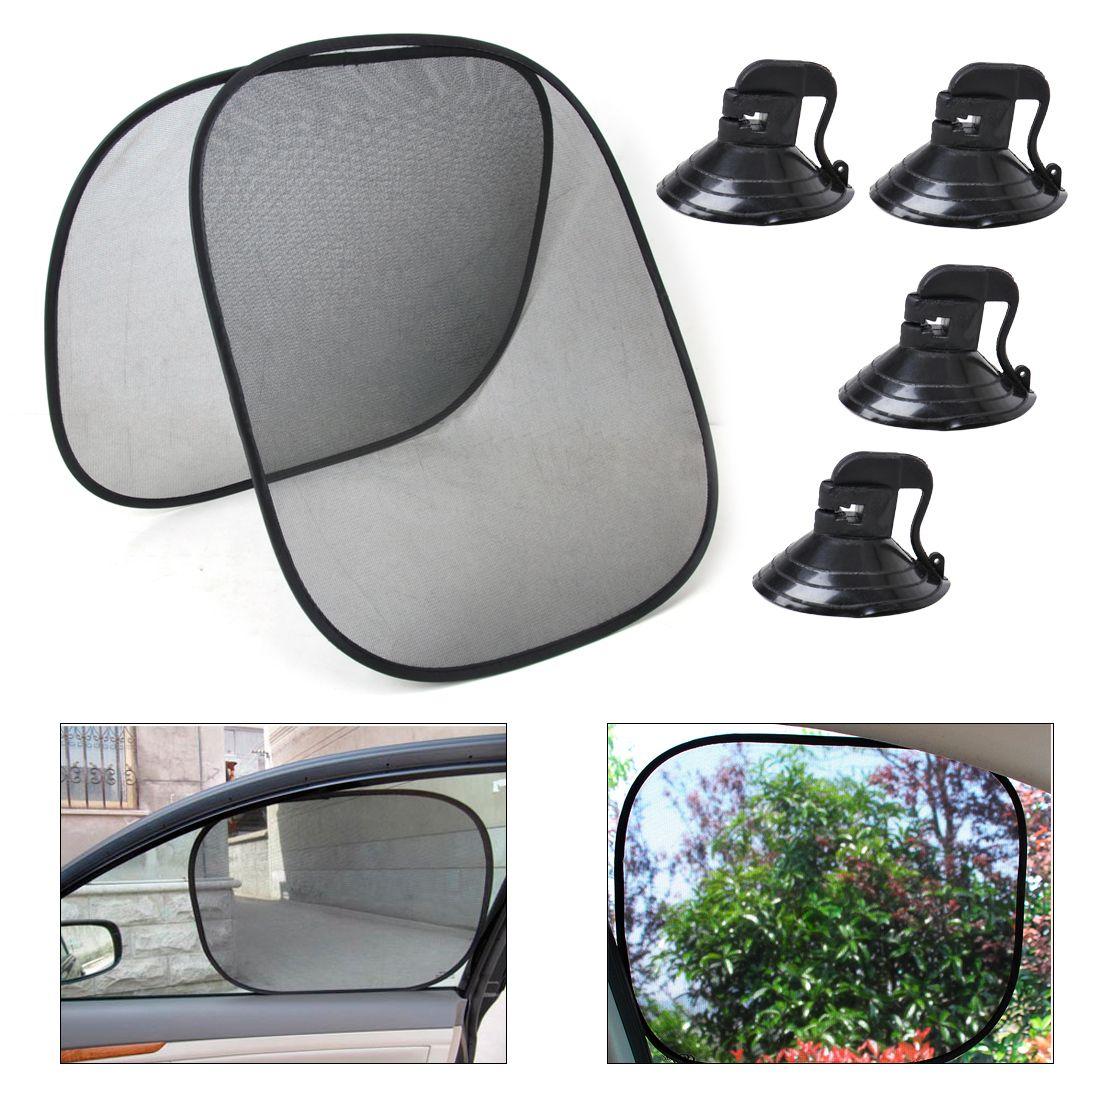 New Arrival High Quality 2pcs Black Foldable Car Side Window Sun Shade  Screen Visor Shield Cover bafaf0cdb31